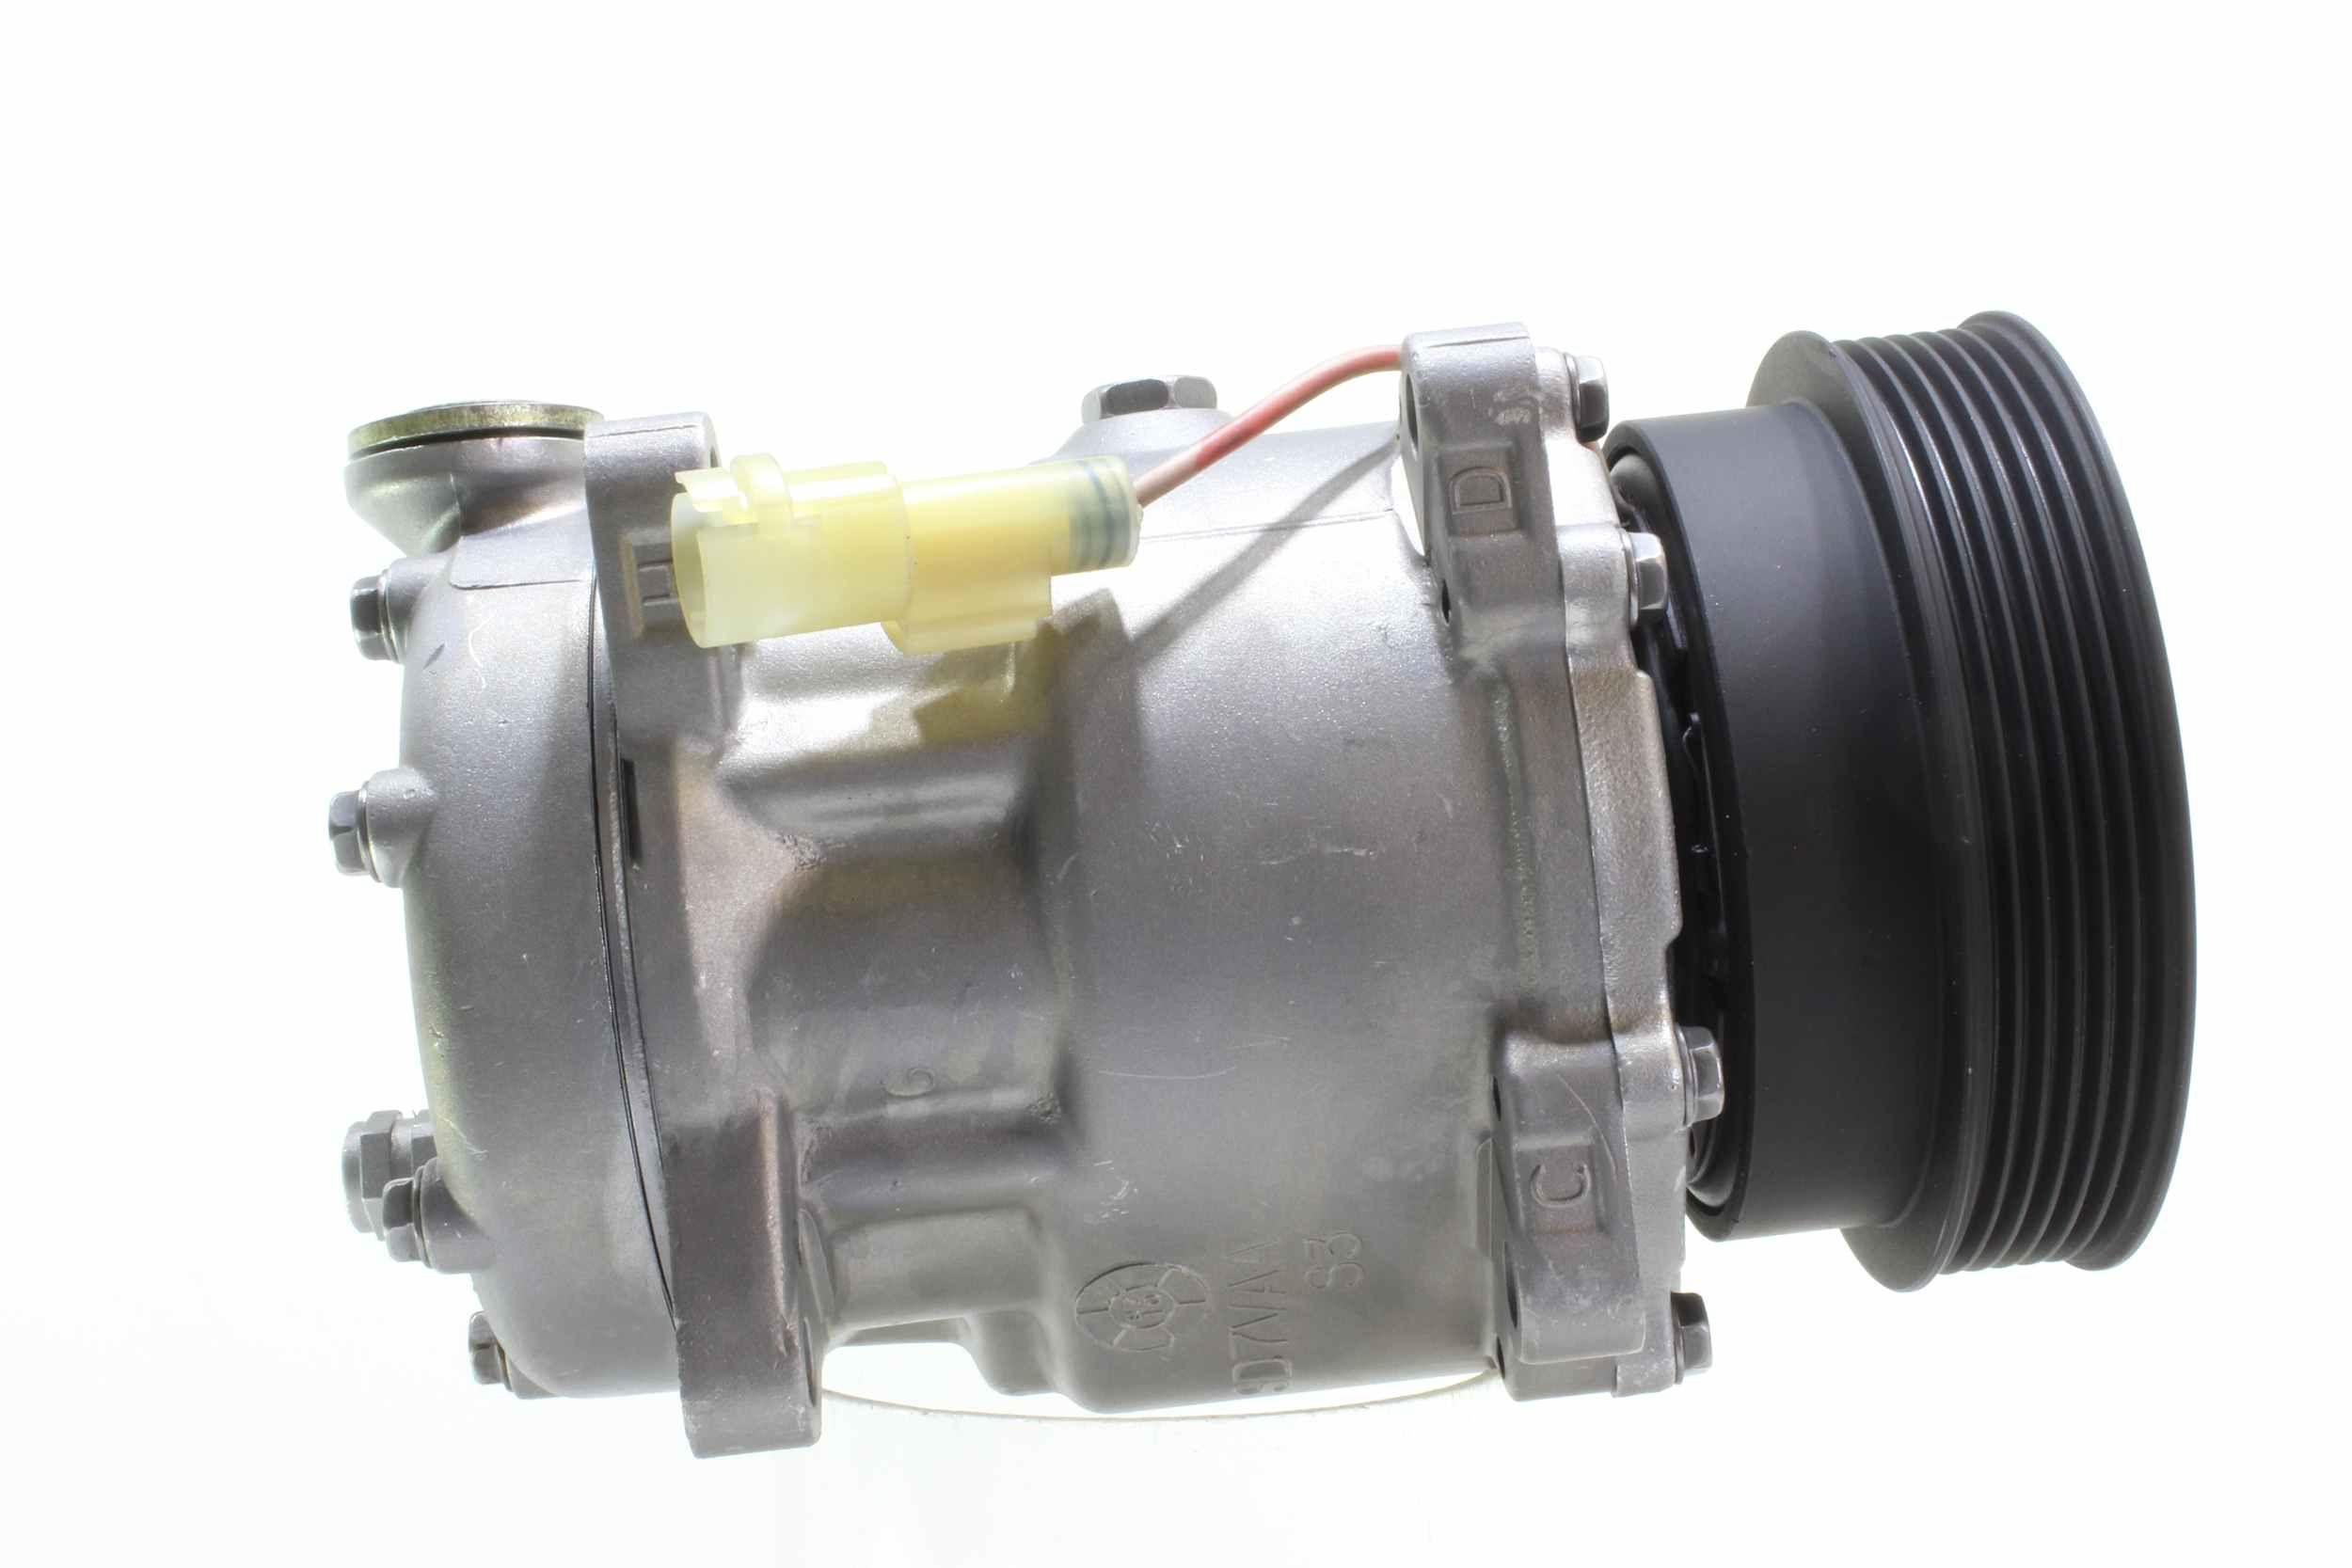 10550346 Klimaanlage Kompressor ALANKO - Markenprodukte billig